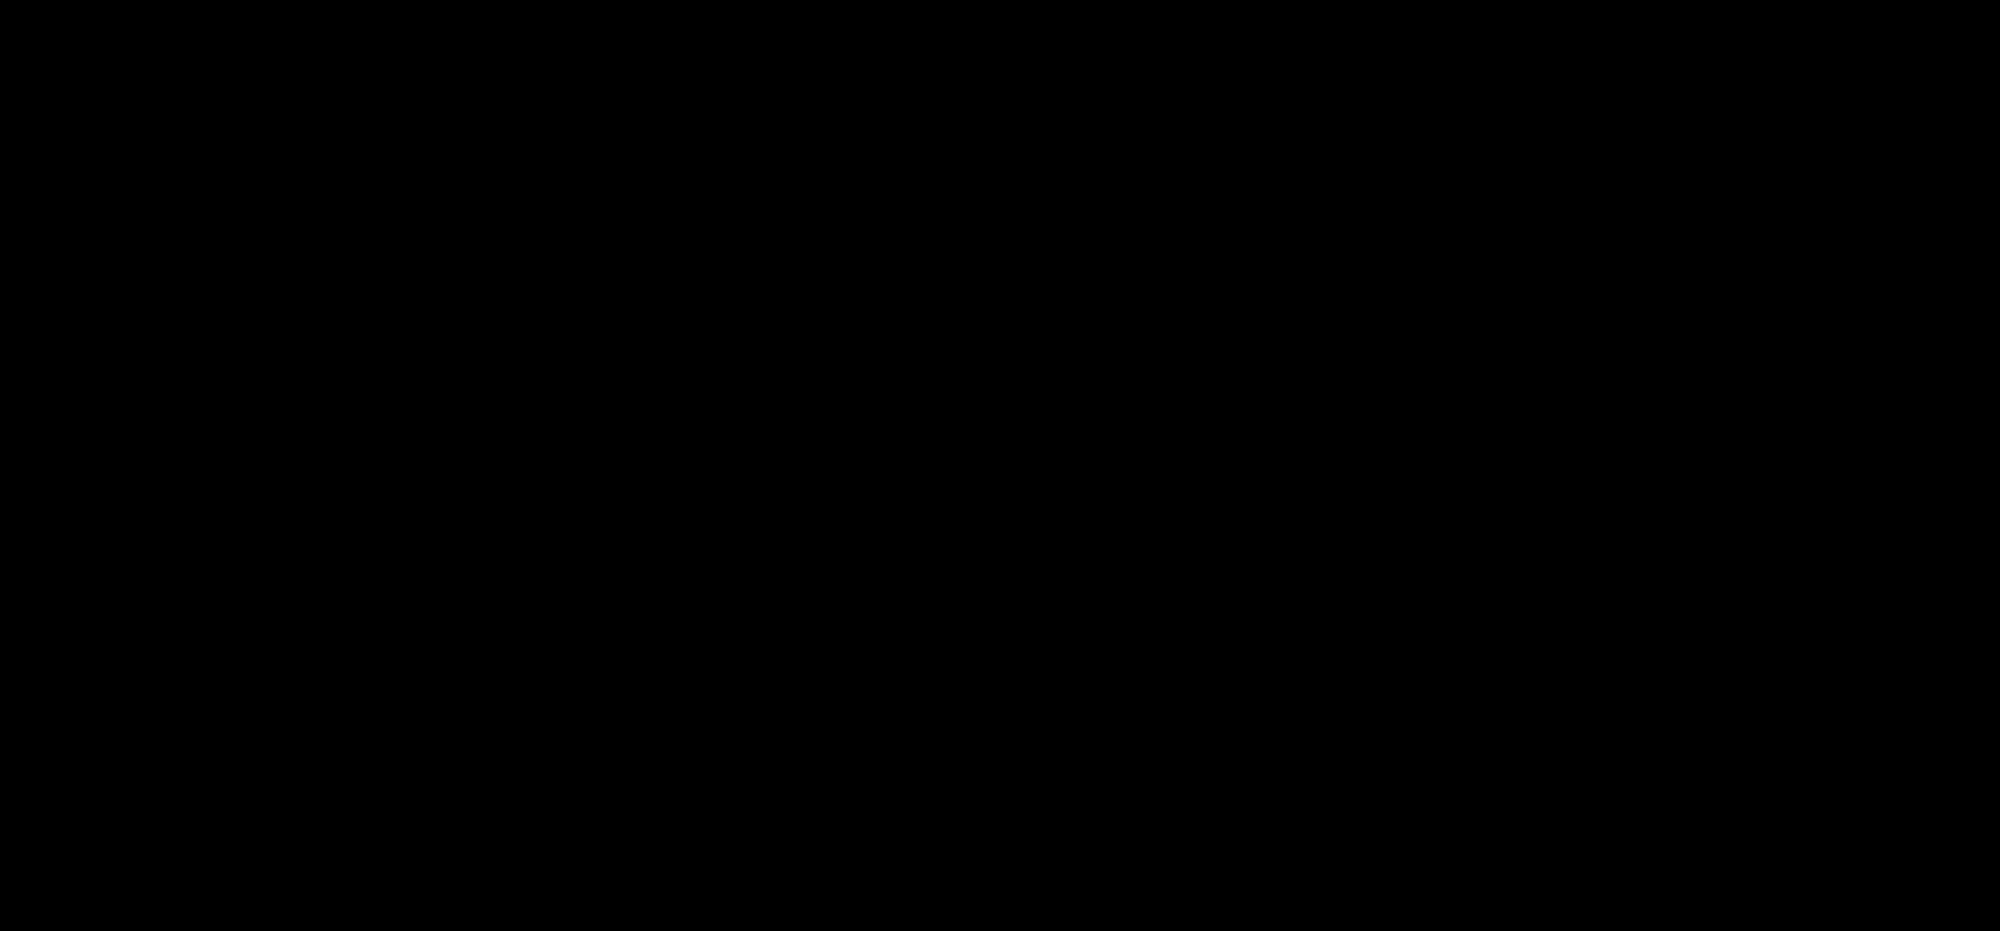 EA electronic arts logo 7 - Electronic Arts Logo